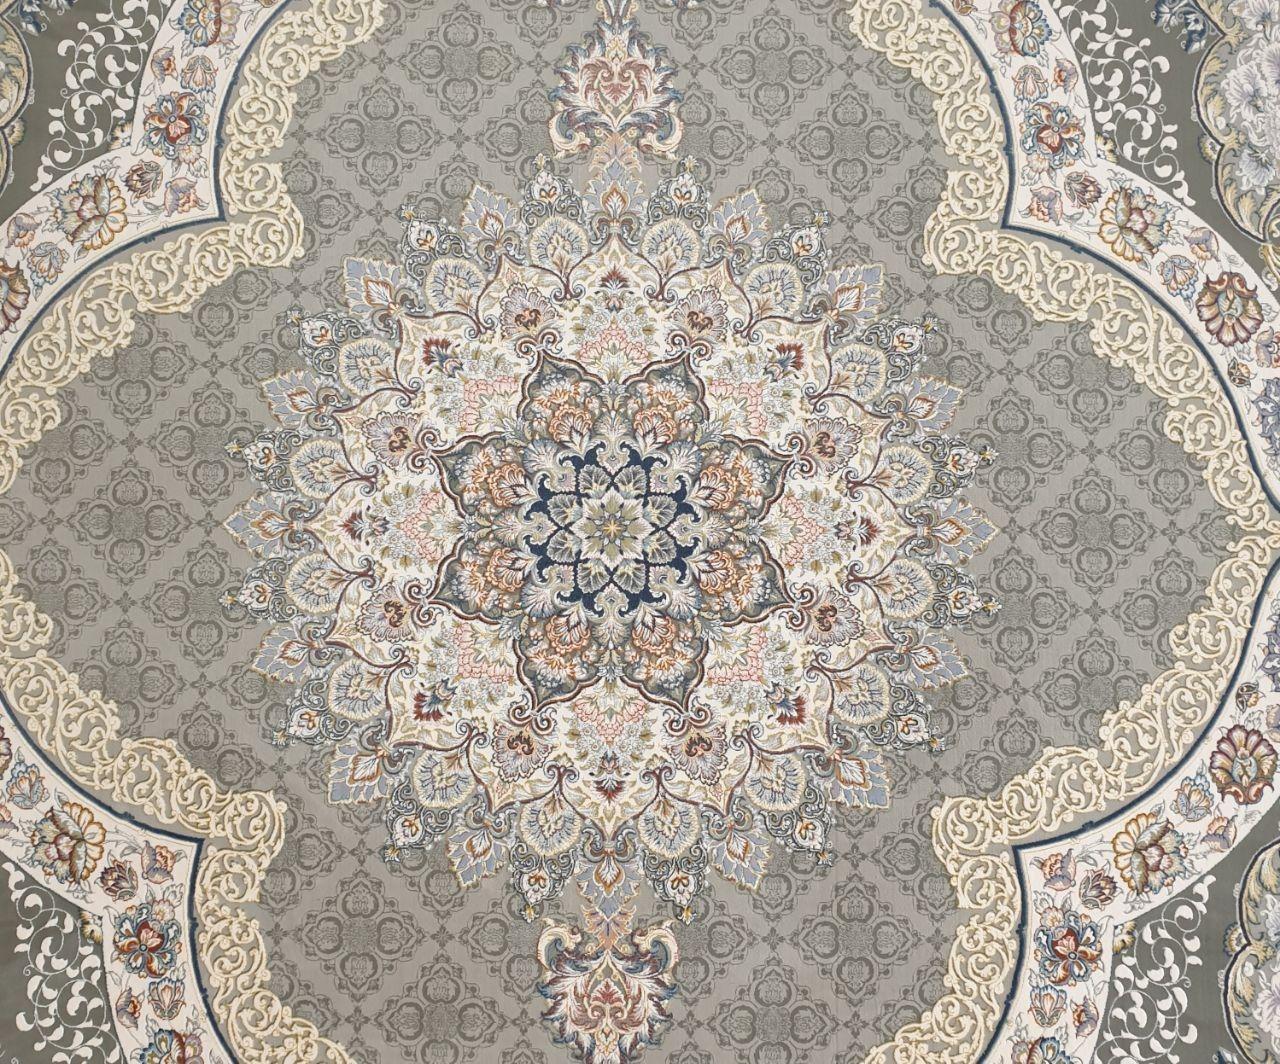 فرش 1200 شانه گل برجسته نقشه رستا زمینه نقره ای